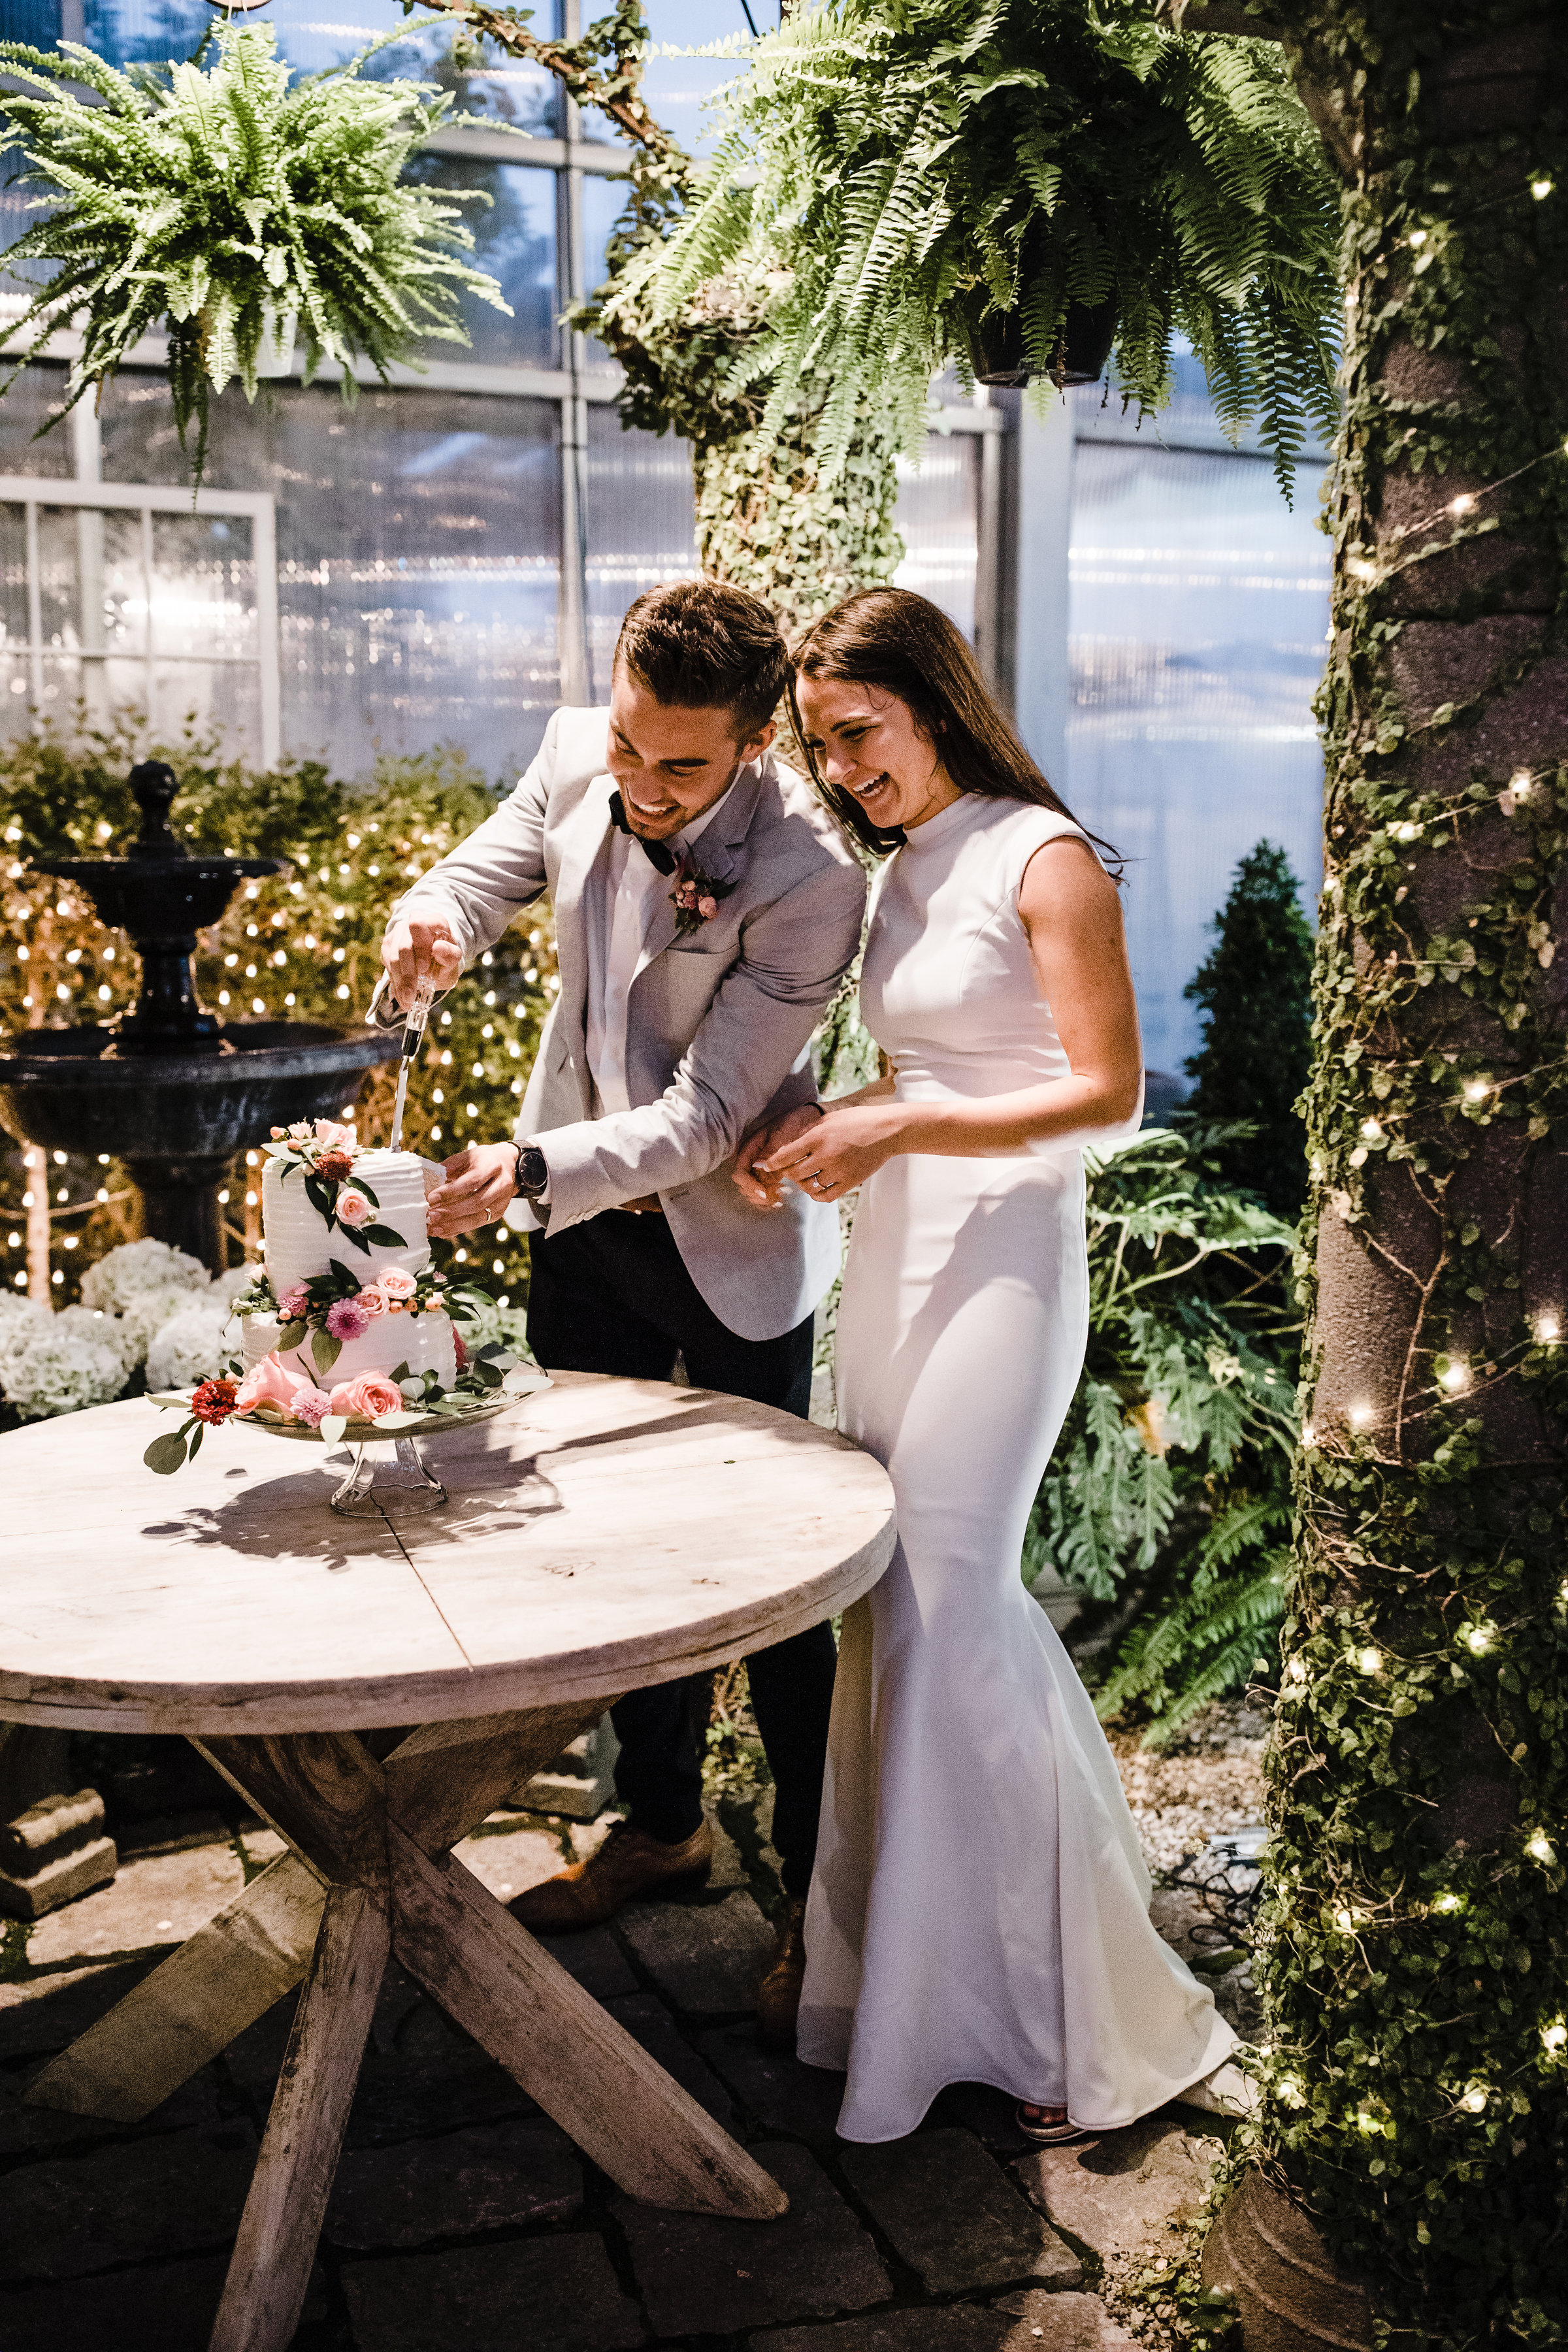 draper wedding reception photographer cutting cake smiling botanicals